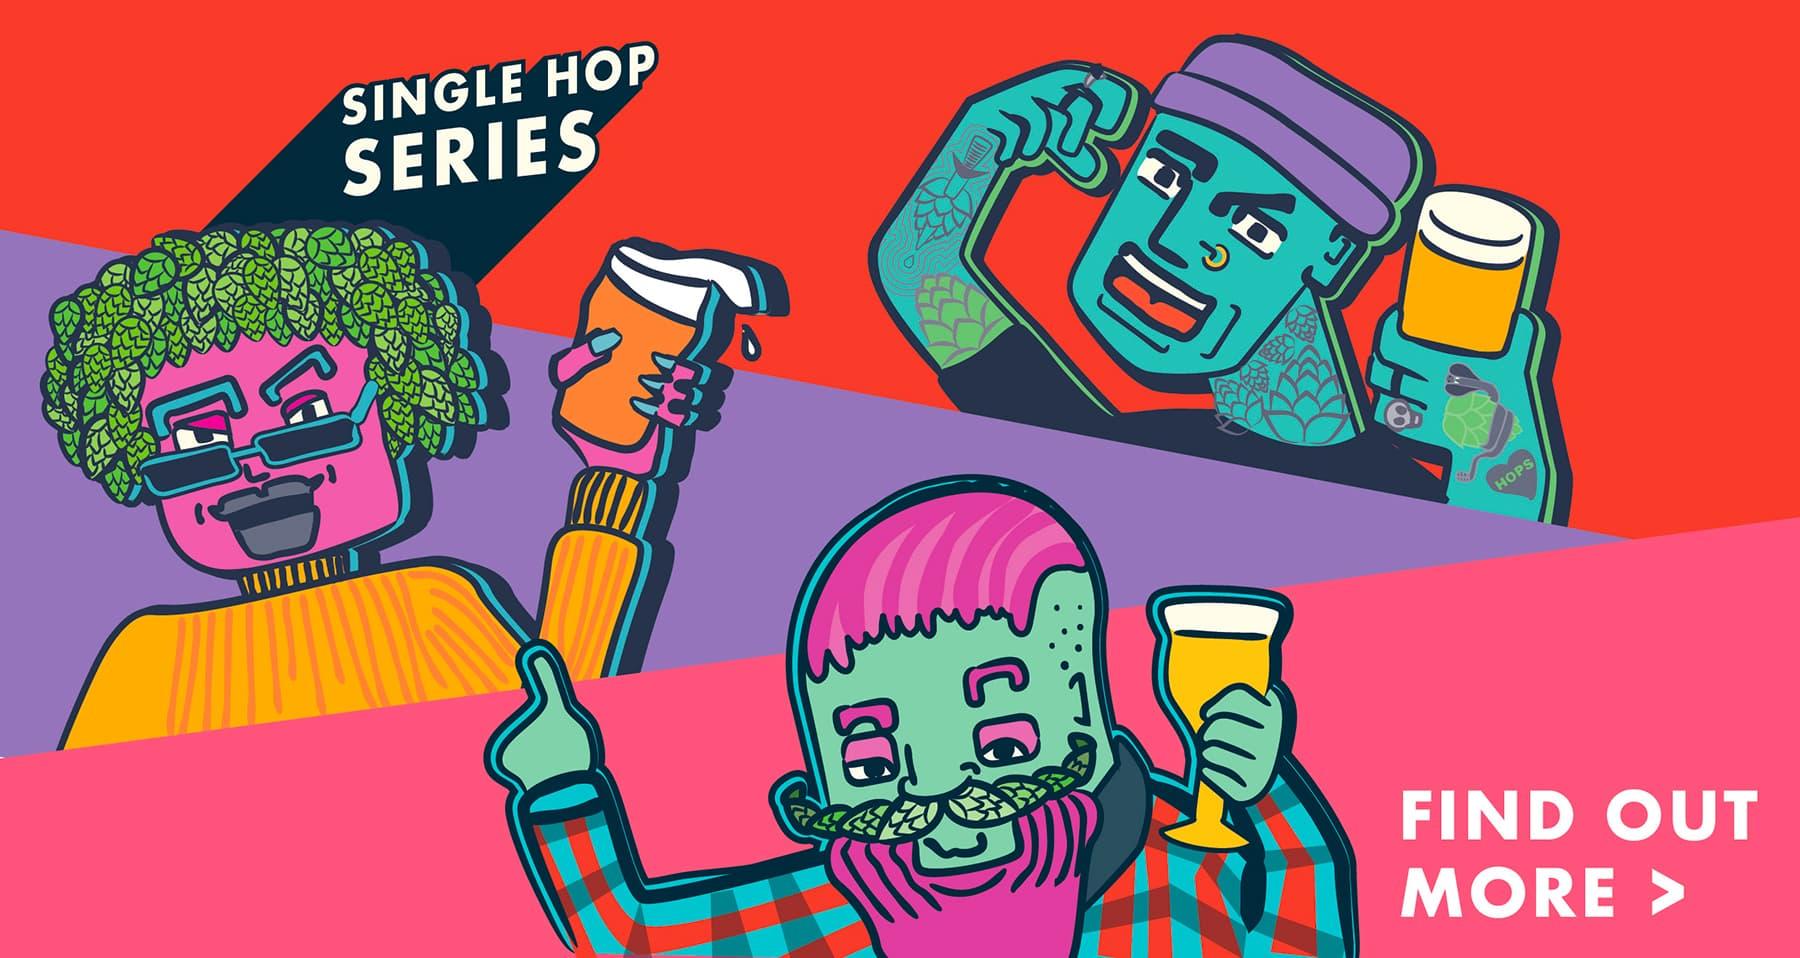 Blackmans Brewery Single Hop Series